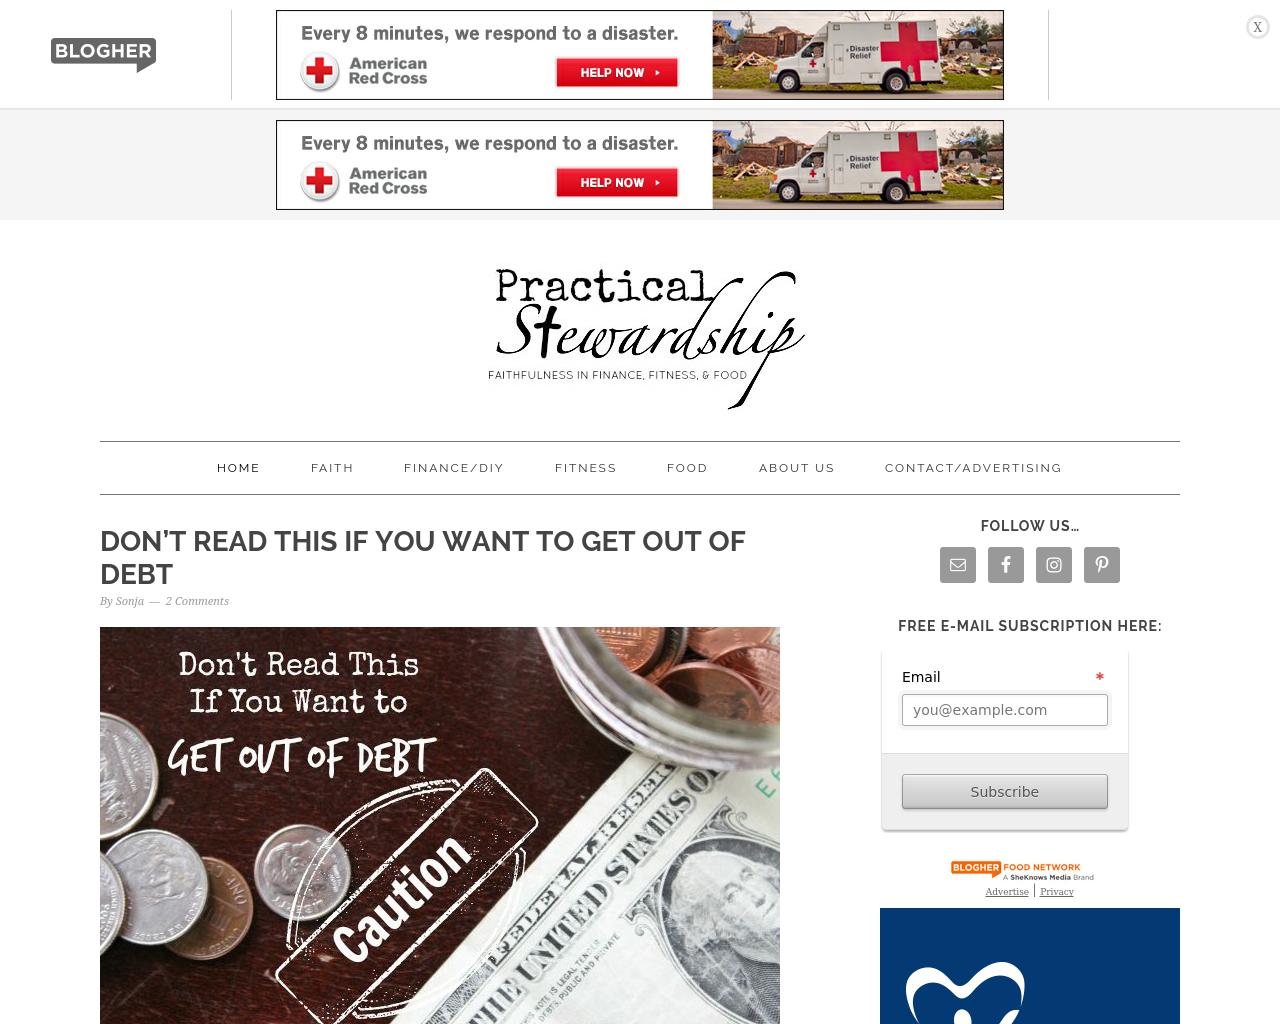 Practical-Stewardship-Advertising-Reviews-Pricing